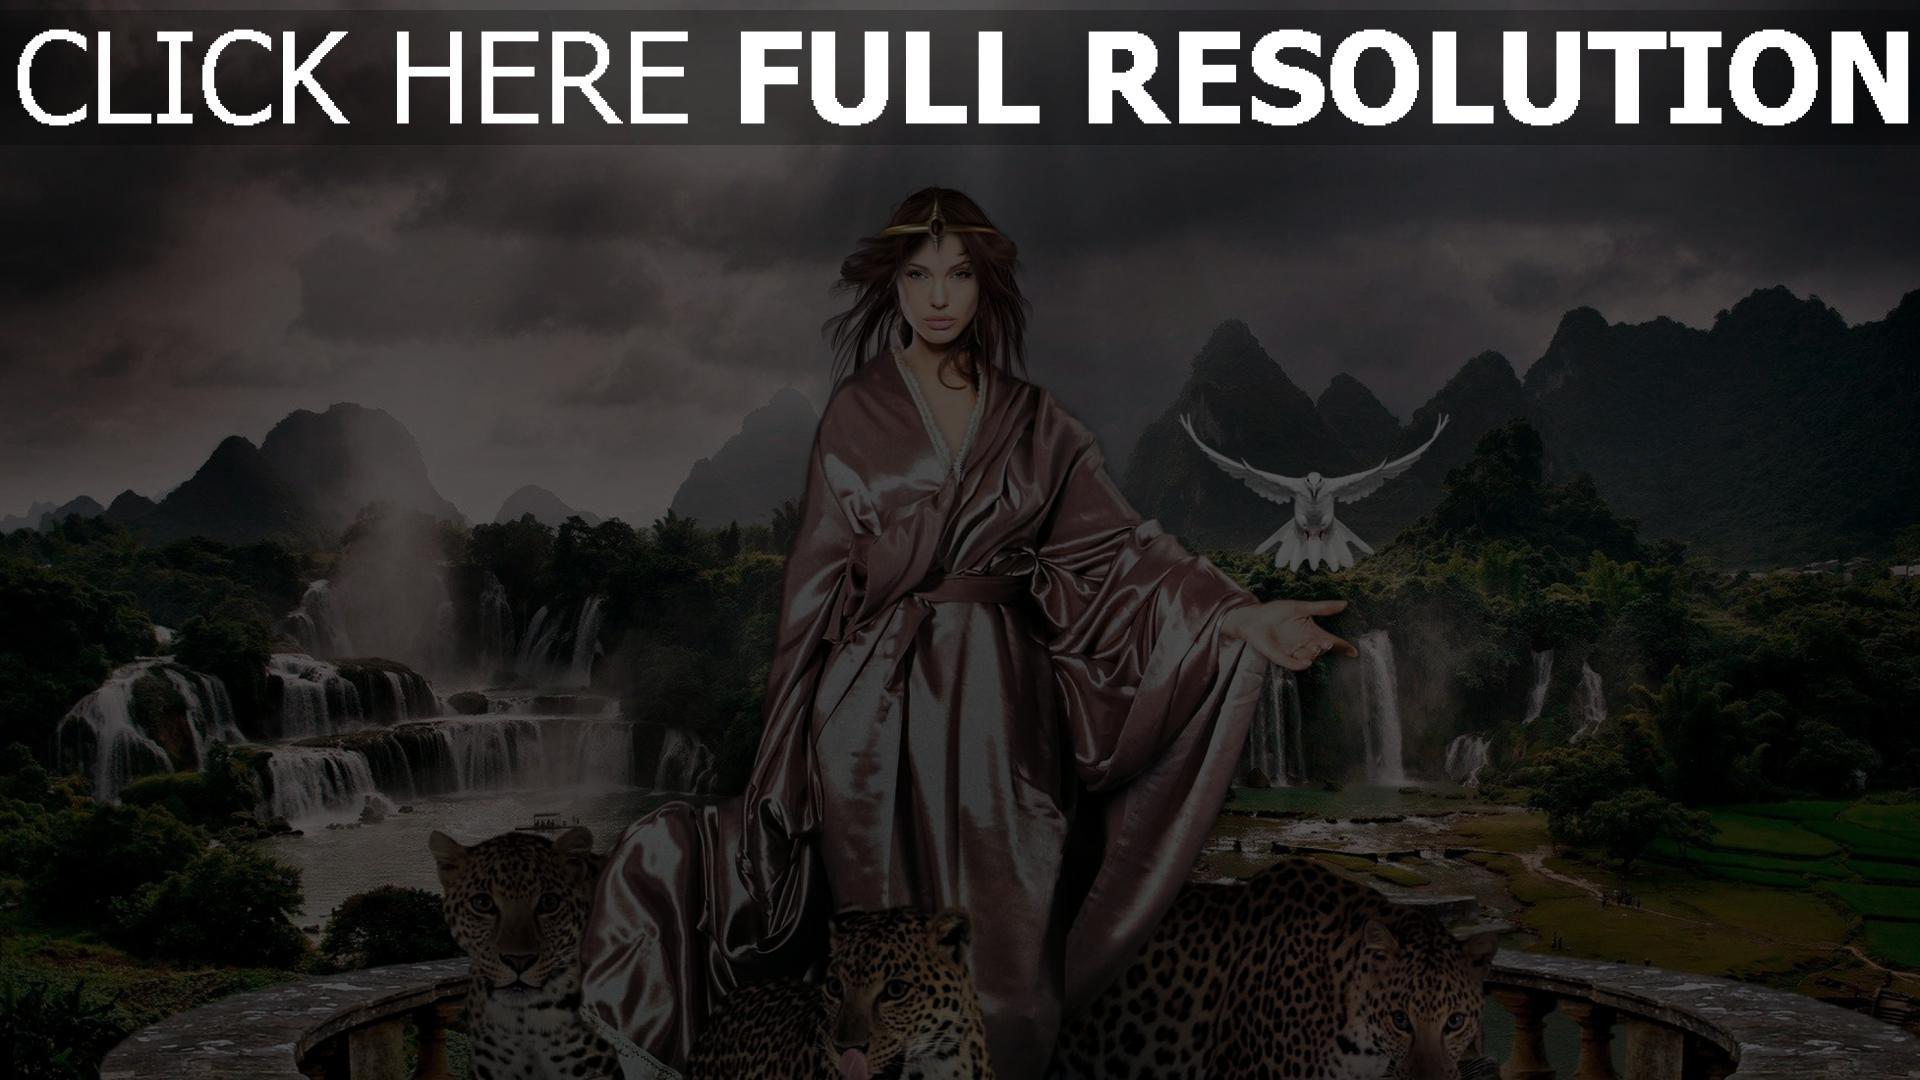 hd hintergrundbilder räuber landschaft flug jaguare vögel mädchen wasserfall 1920x1080